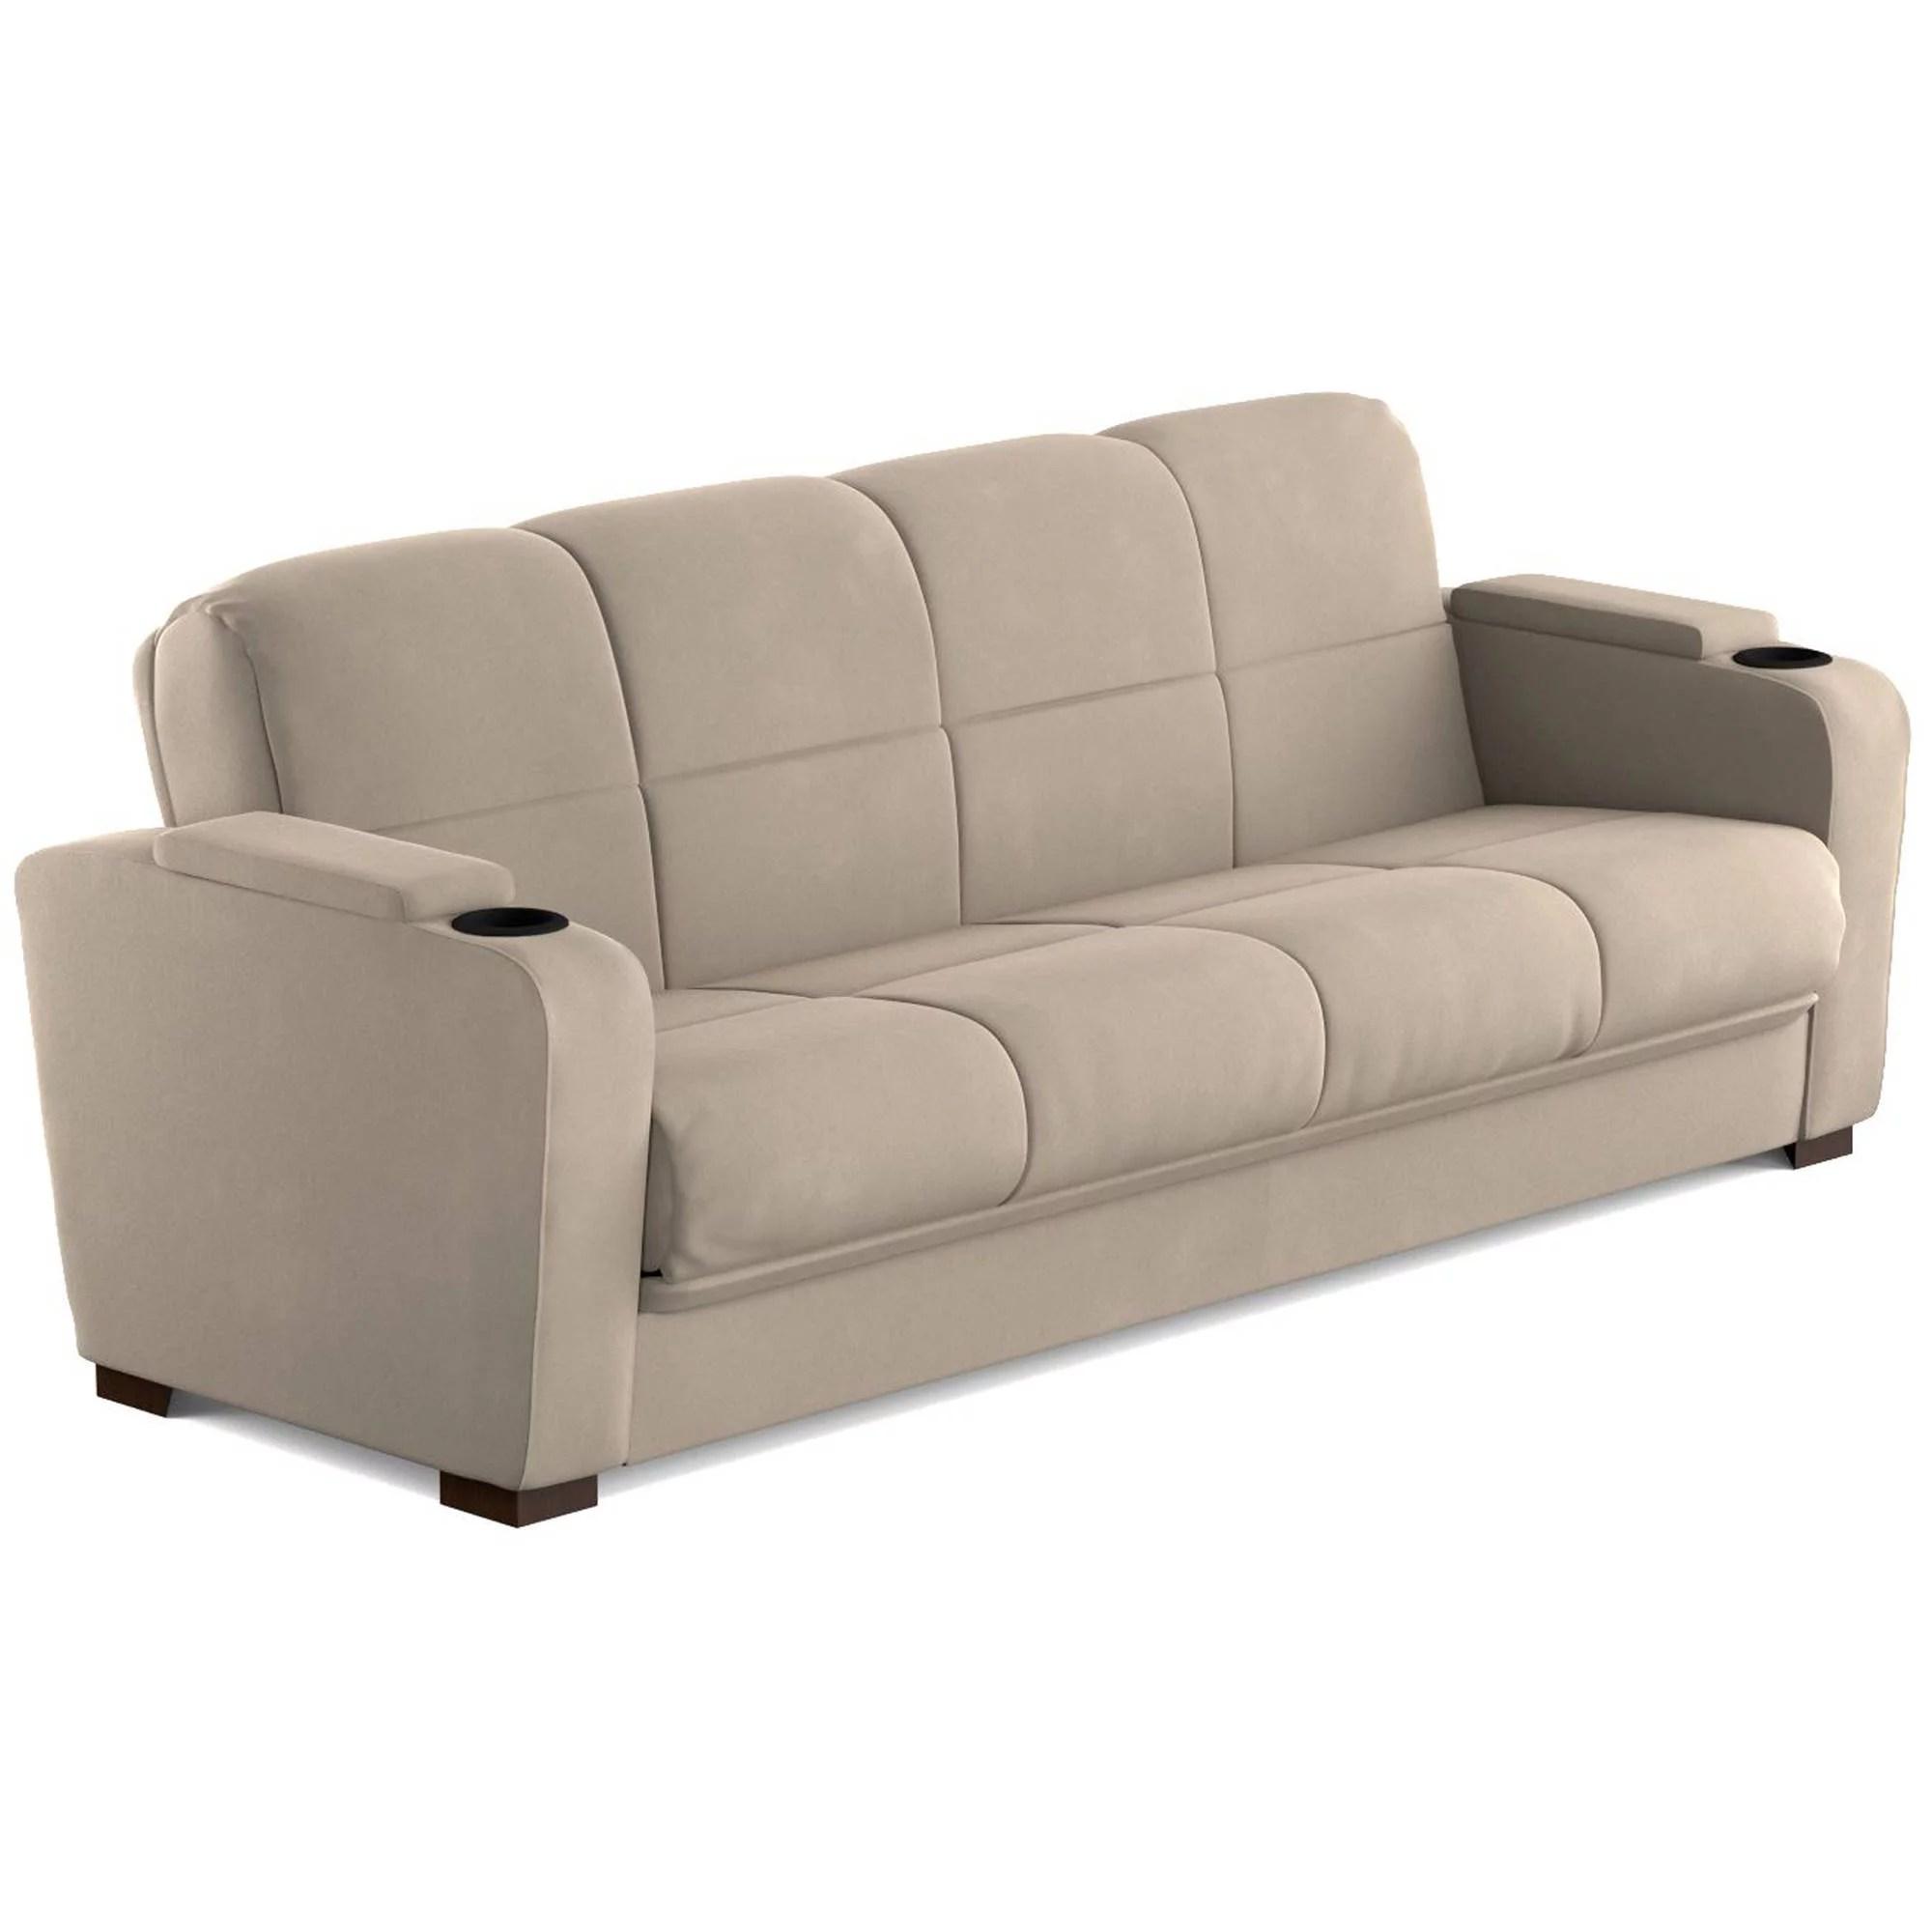 mainstays tyler futon with storage sofa